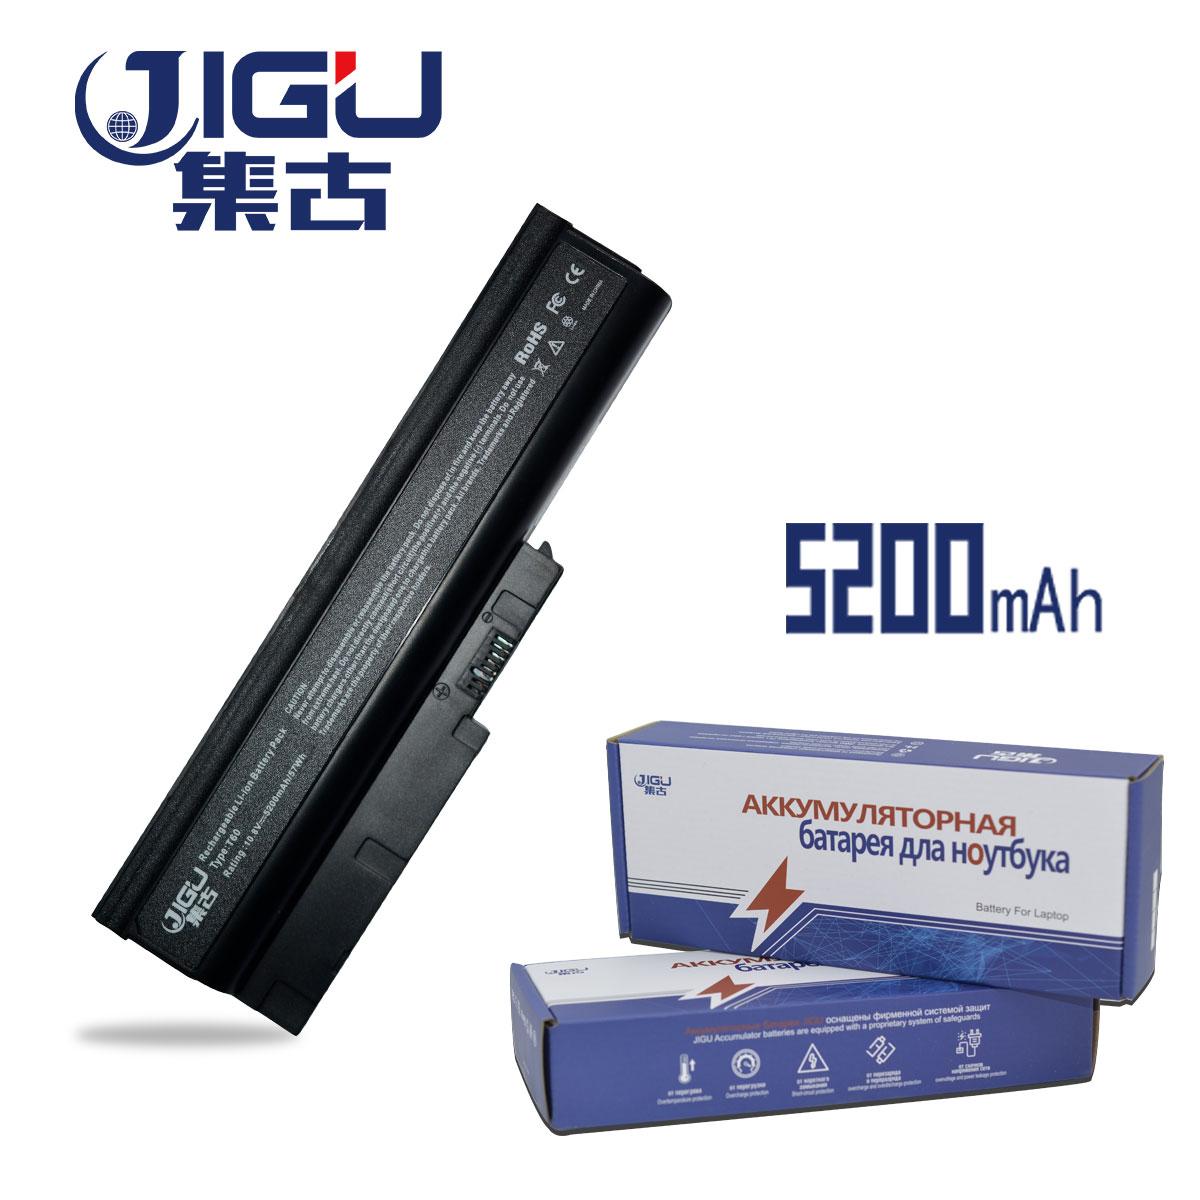 Jigu Laptop Batterij Voor Lenovo Sl500 40Y6799 92P1138 92P1140 92P1142 42T4504 42T4513 42T5233 92P1137 92P1139 92P1141